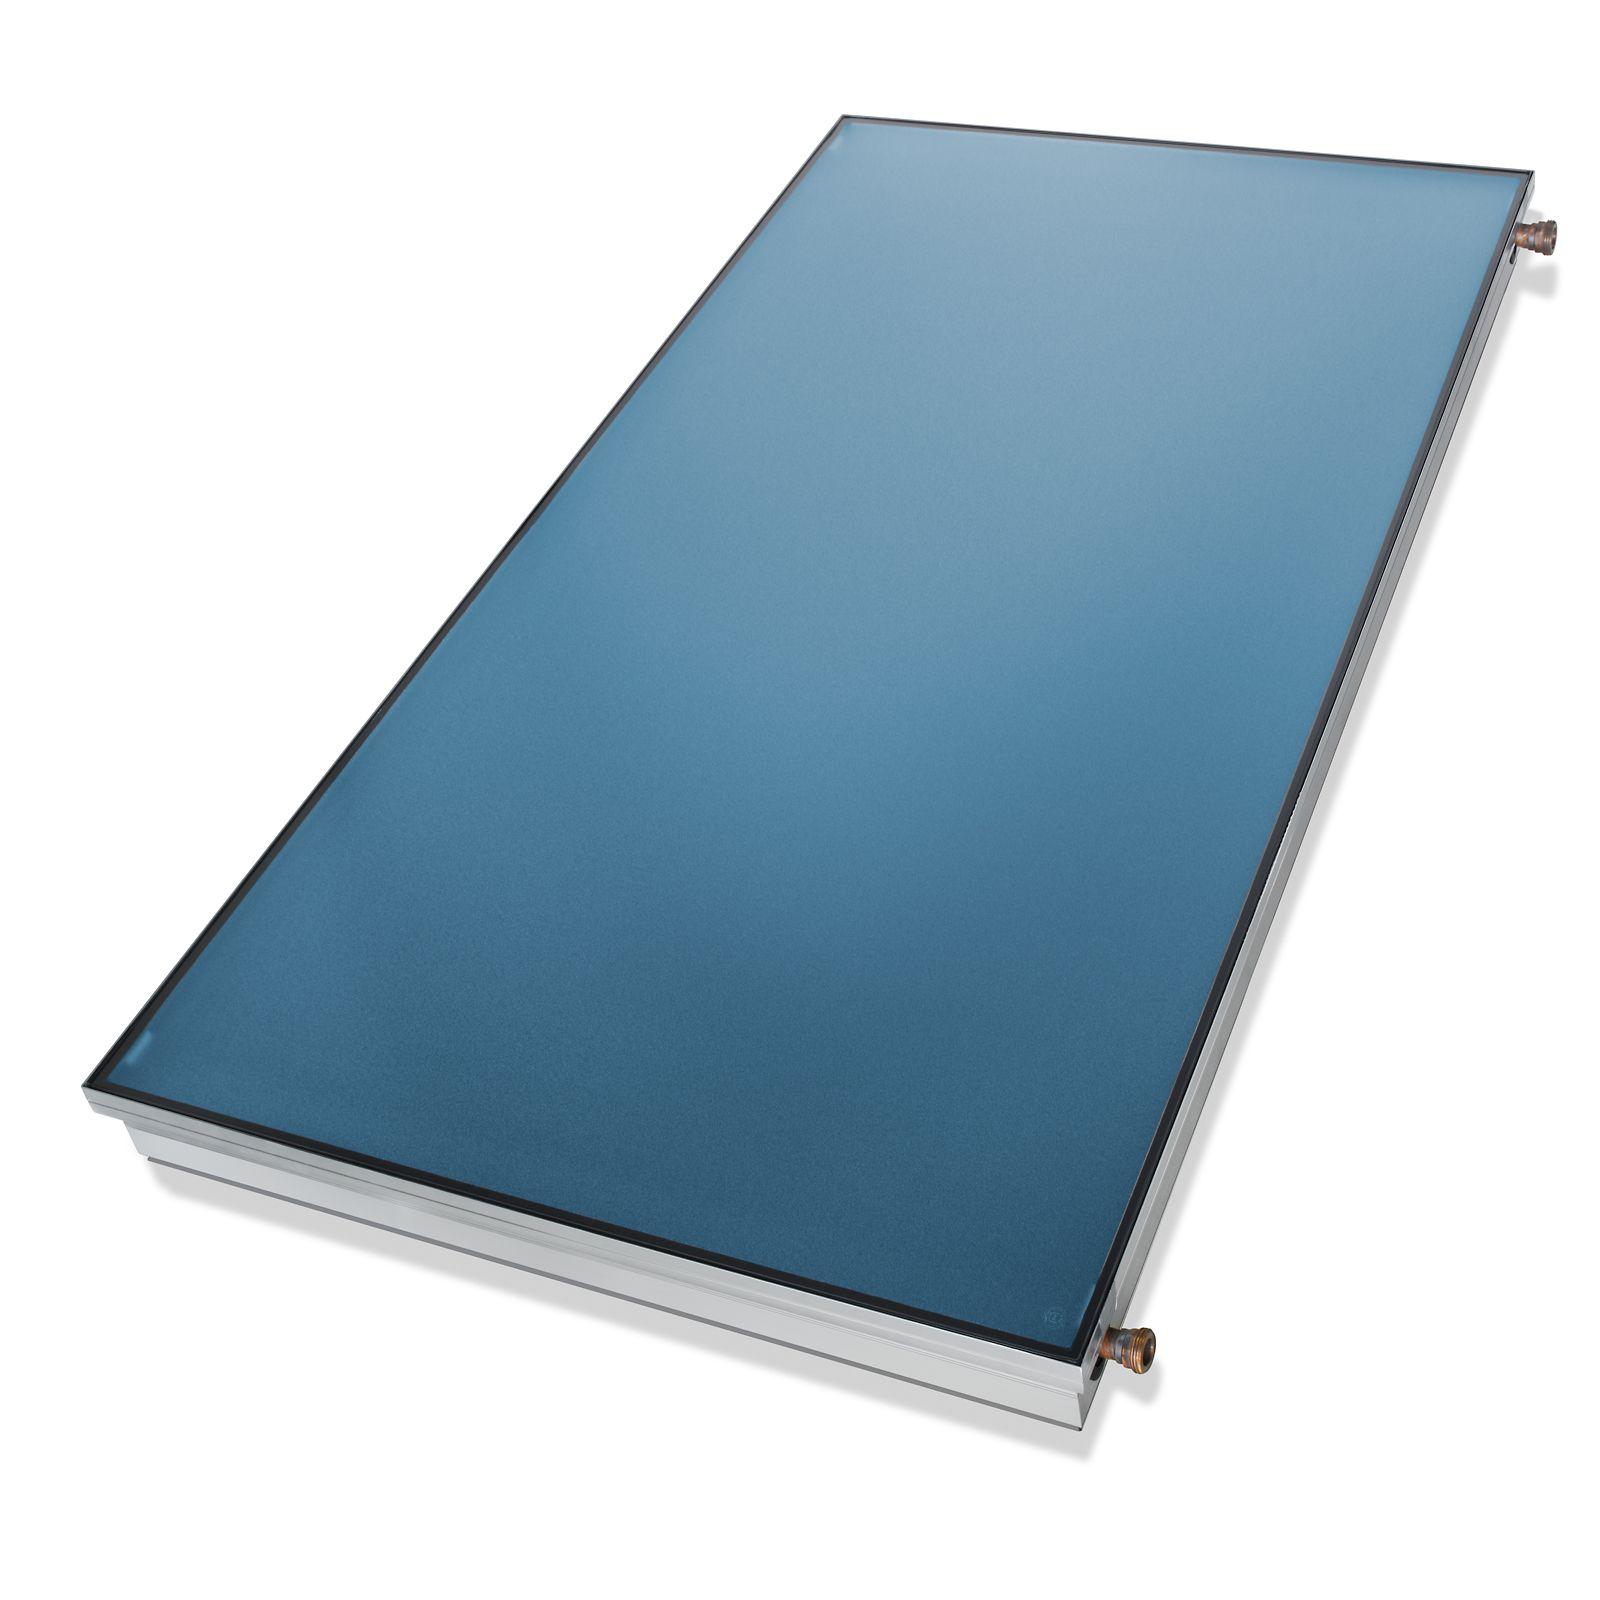 FLK-200 Solar Flachkollektor hagelsicher 2,34 m2 Killus-technik.de